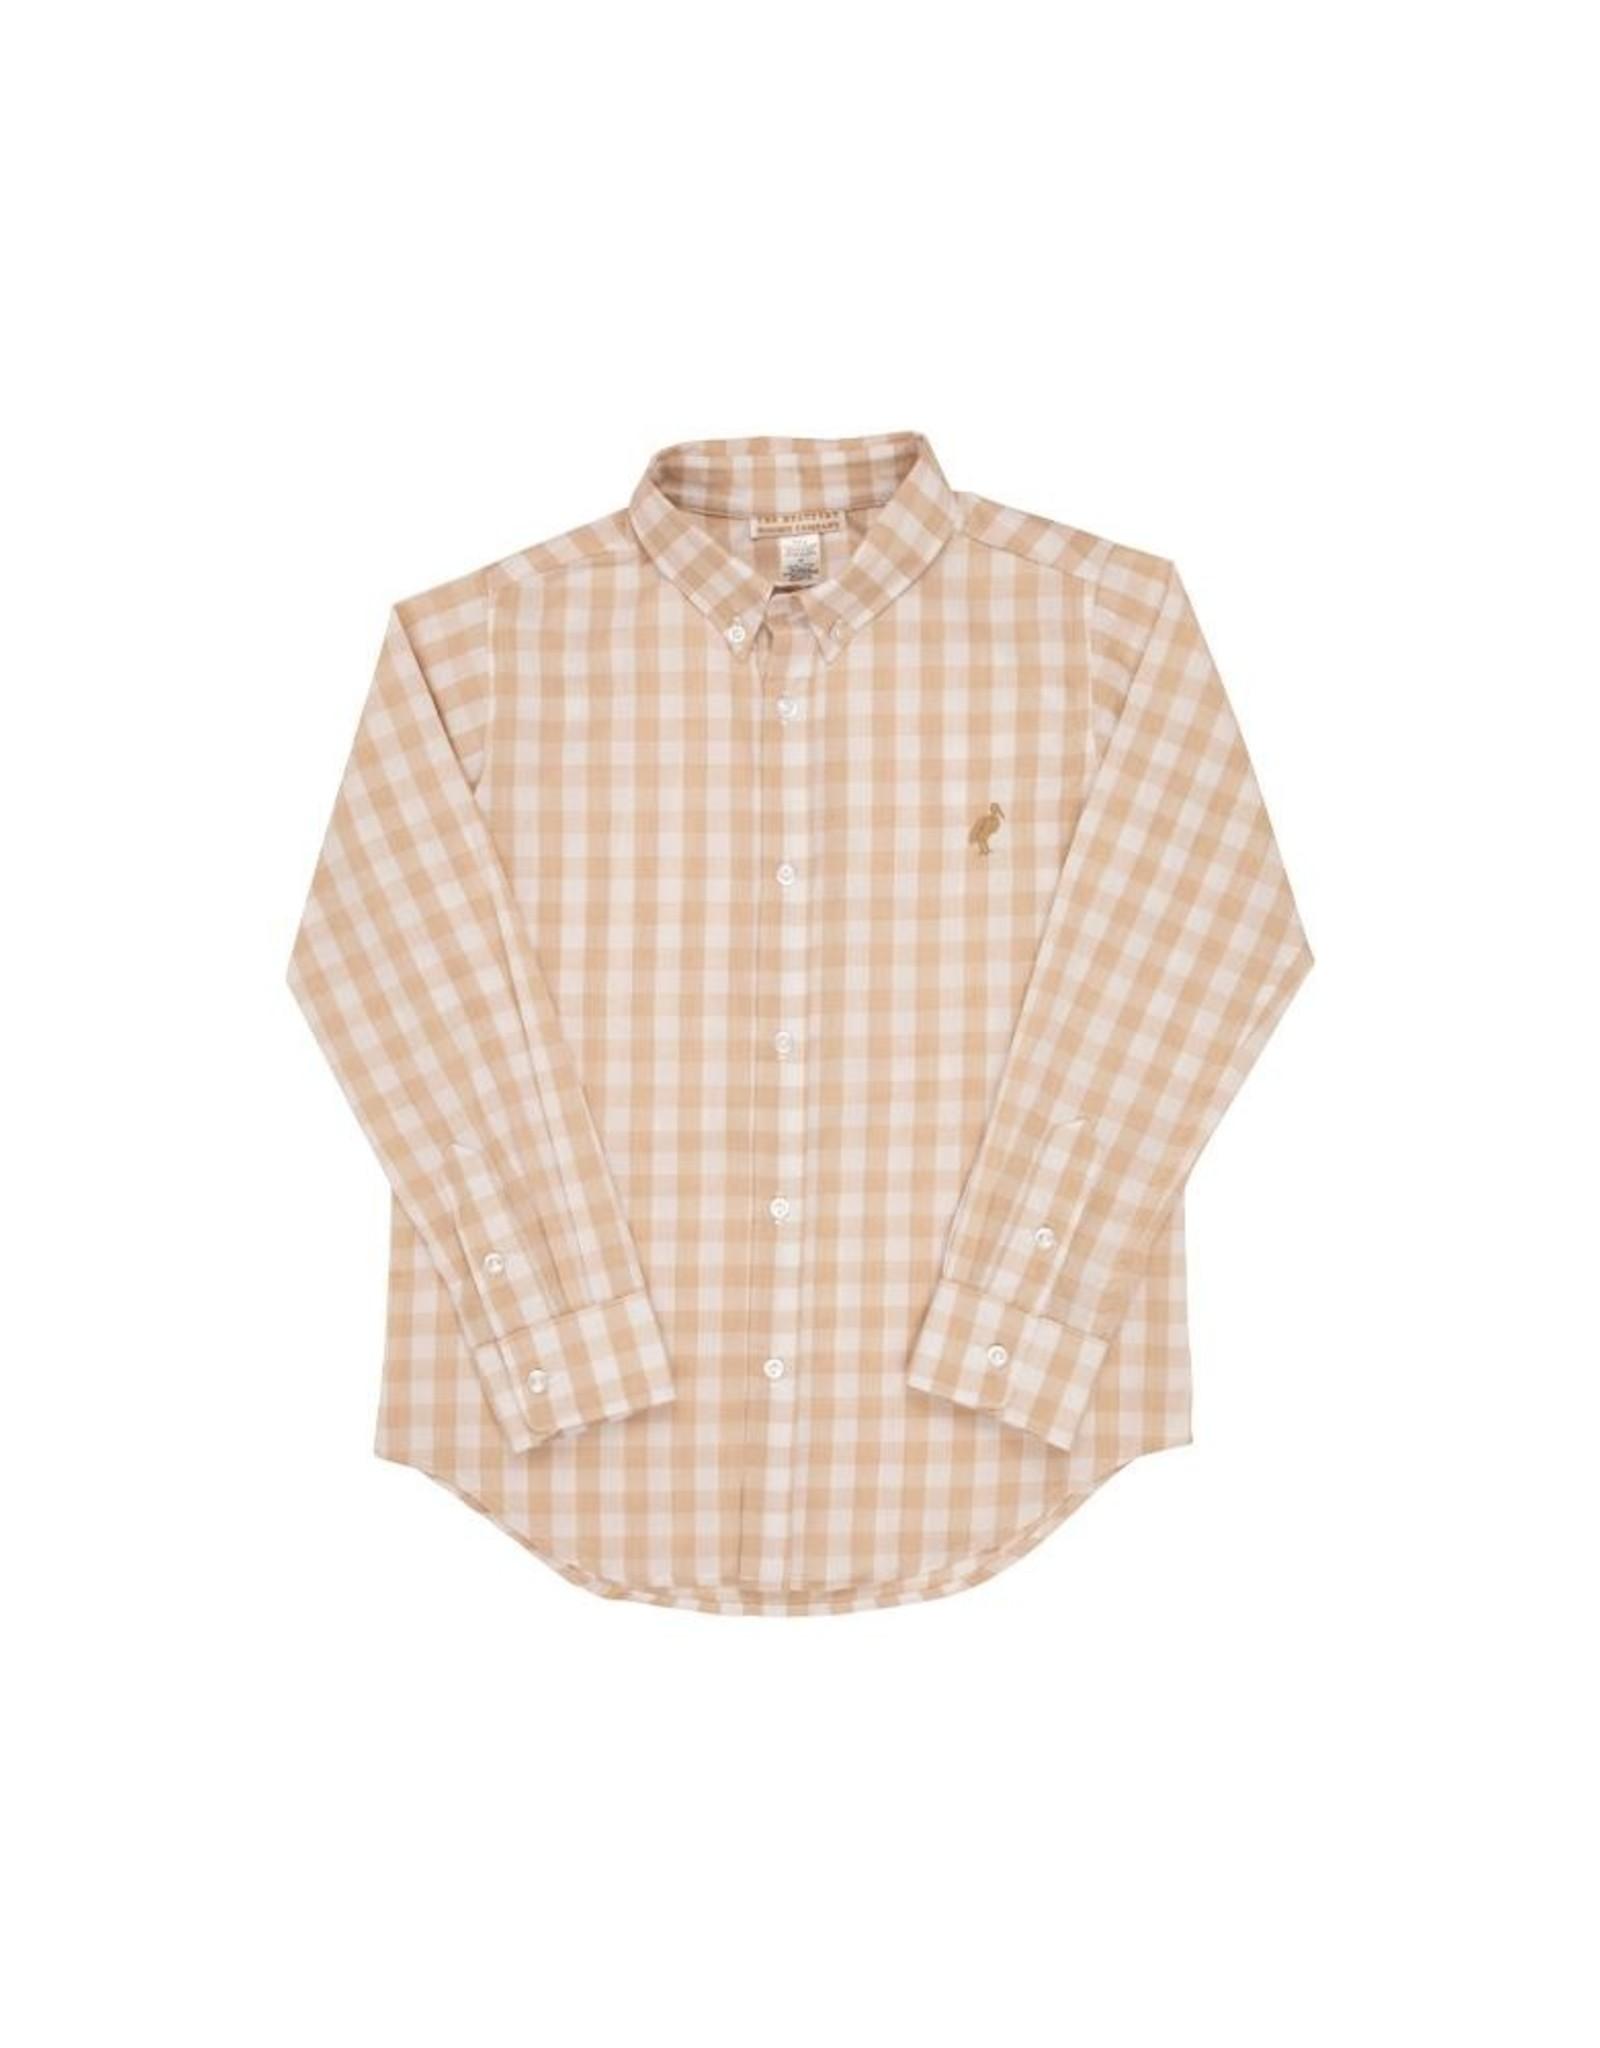 The Beaufort Bonnet Company Deans List Dress Shirt, Keeneland Khaki Check